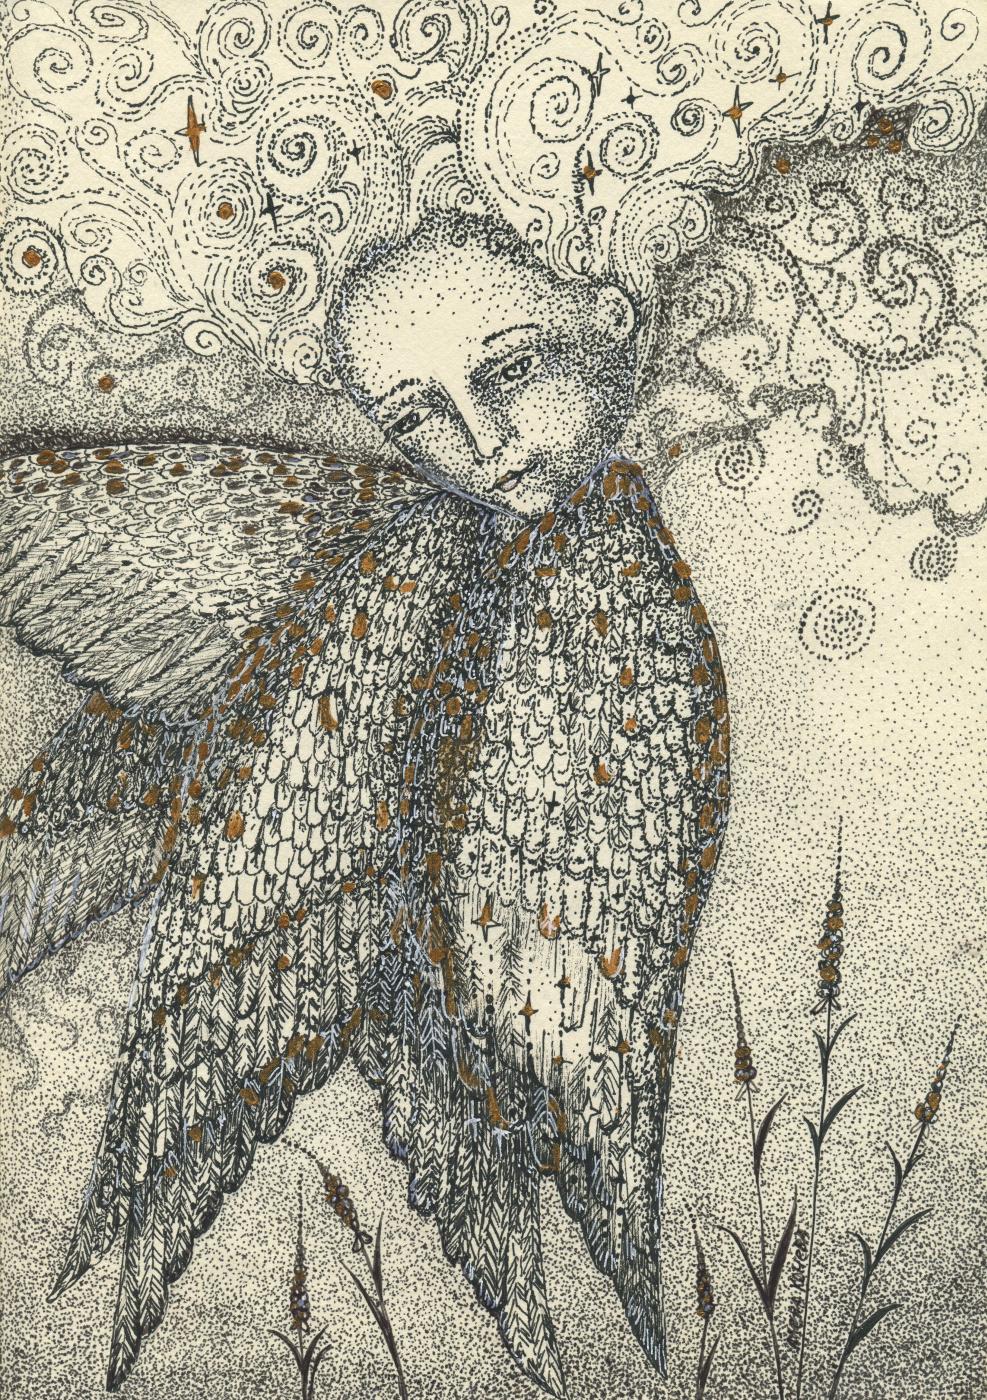 Olyona Ivanovna Koneva. Angel. Space. Gold. Print